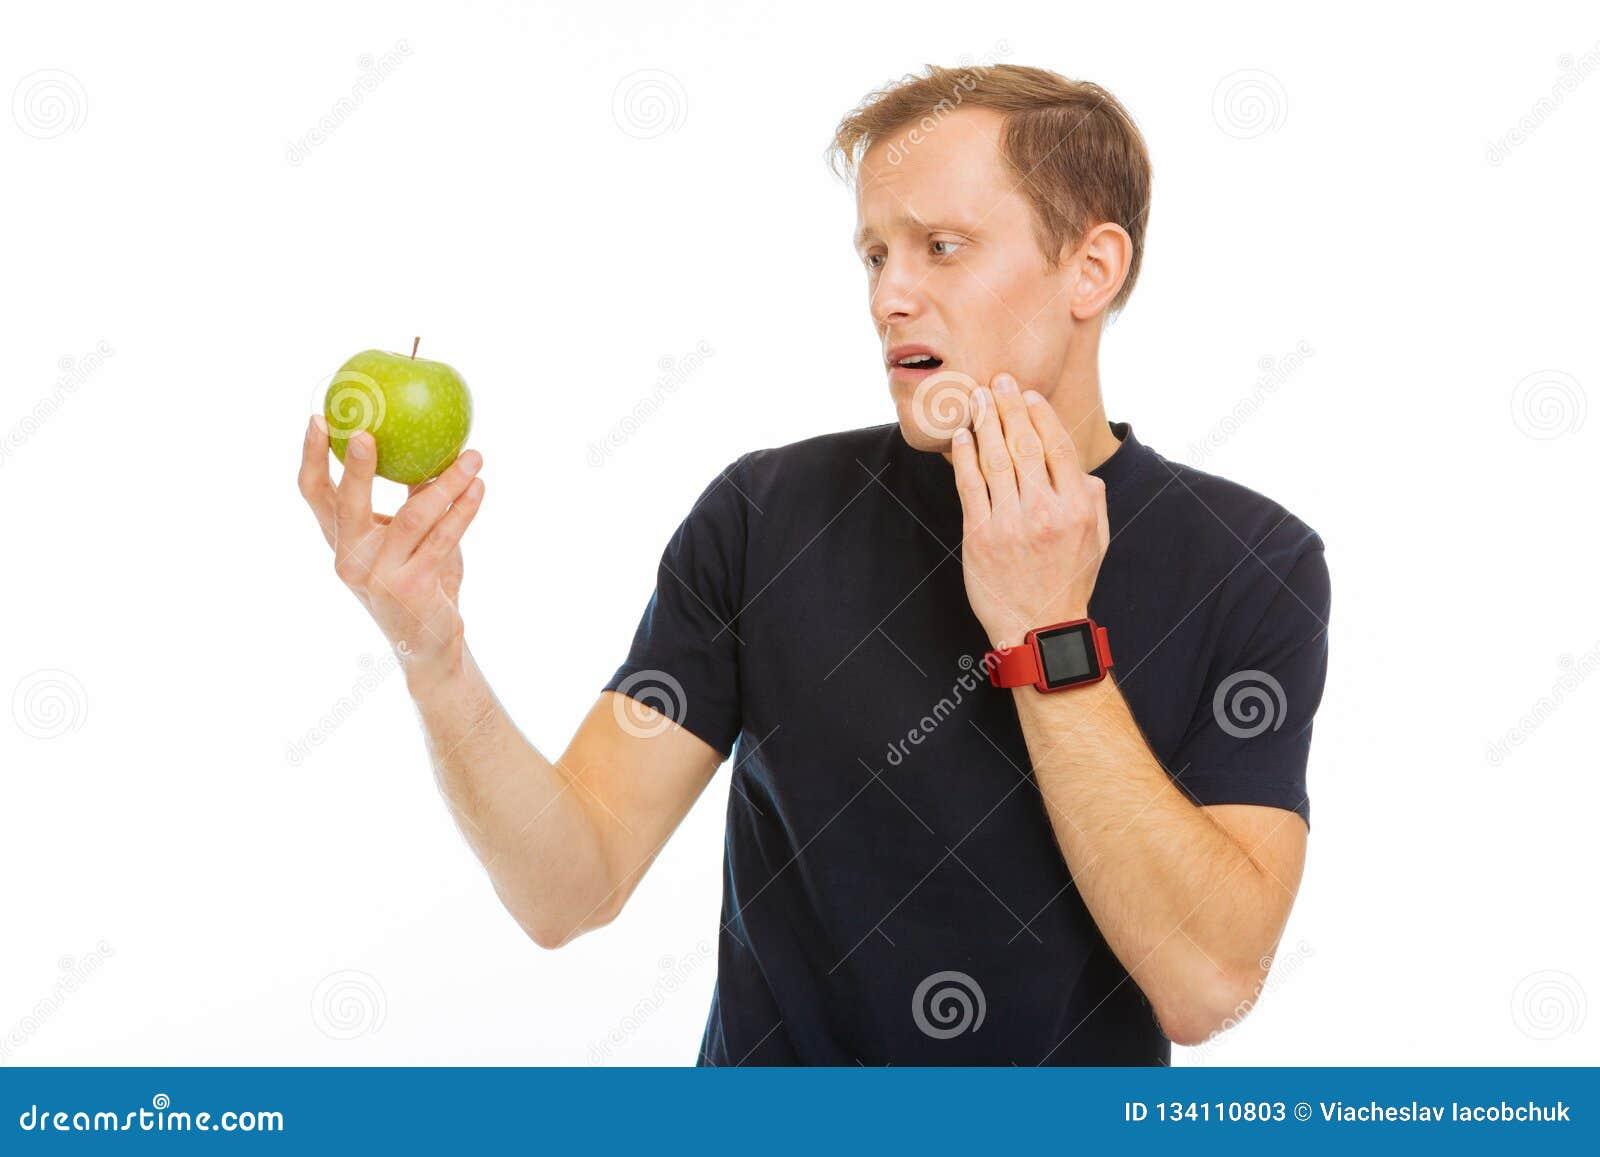 Sad cheerless man looking at the green apple